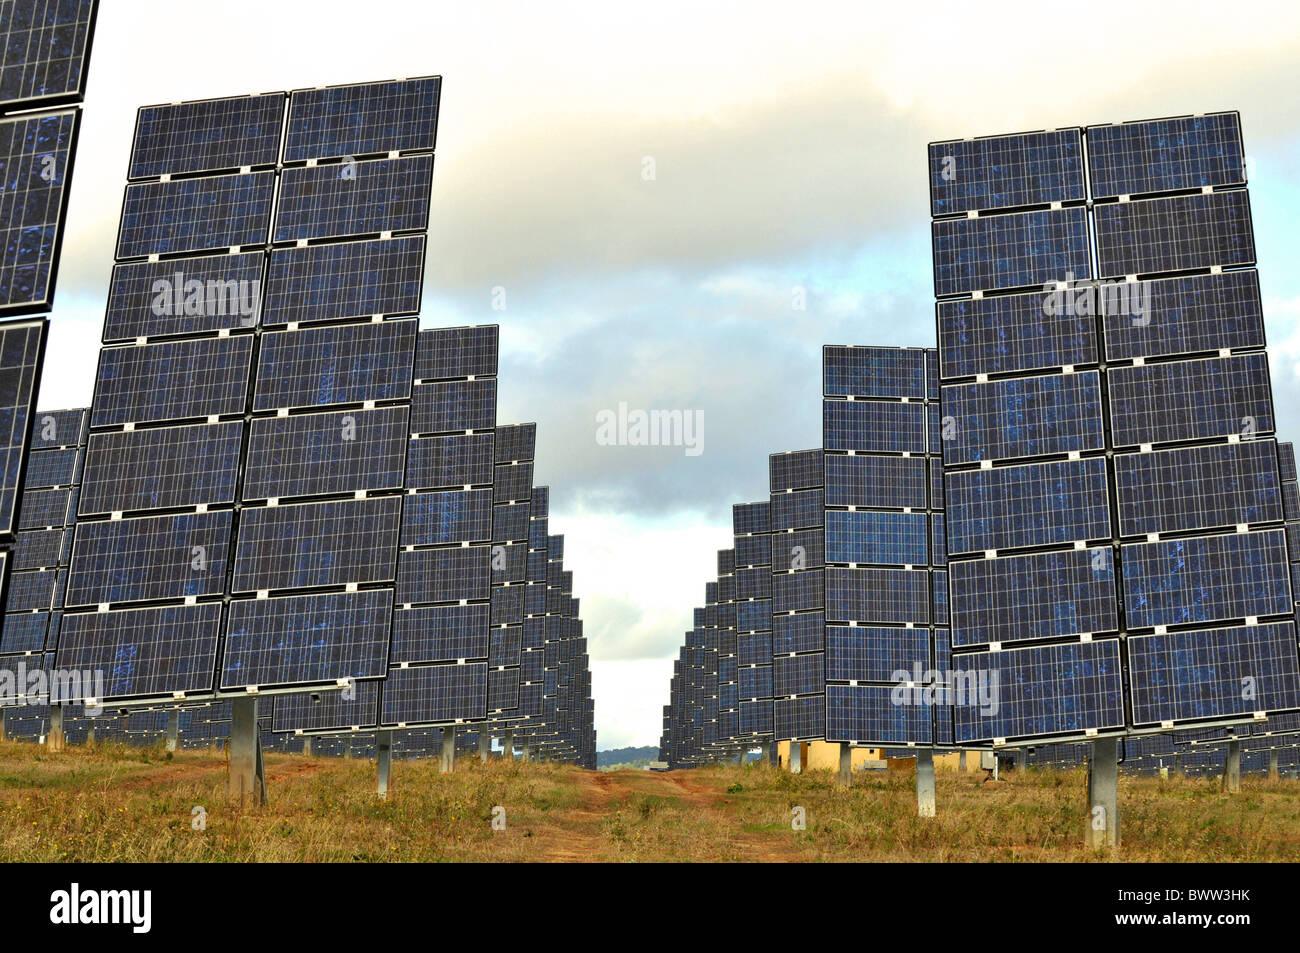 Solar power farm, solar power park complex at Los Arcos, Navarra, Spain - Stock Image